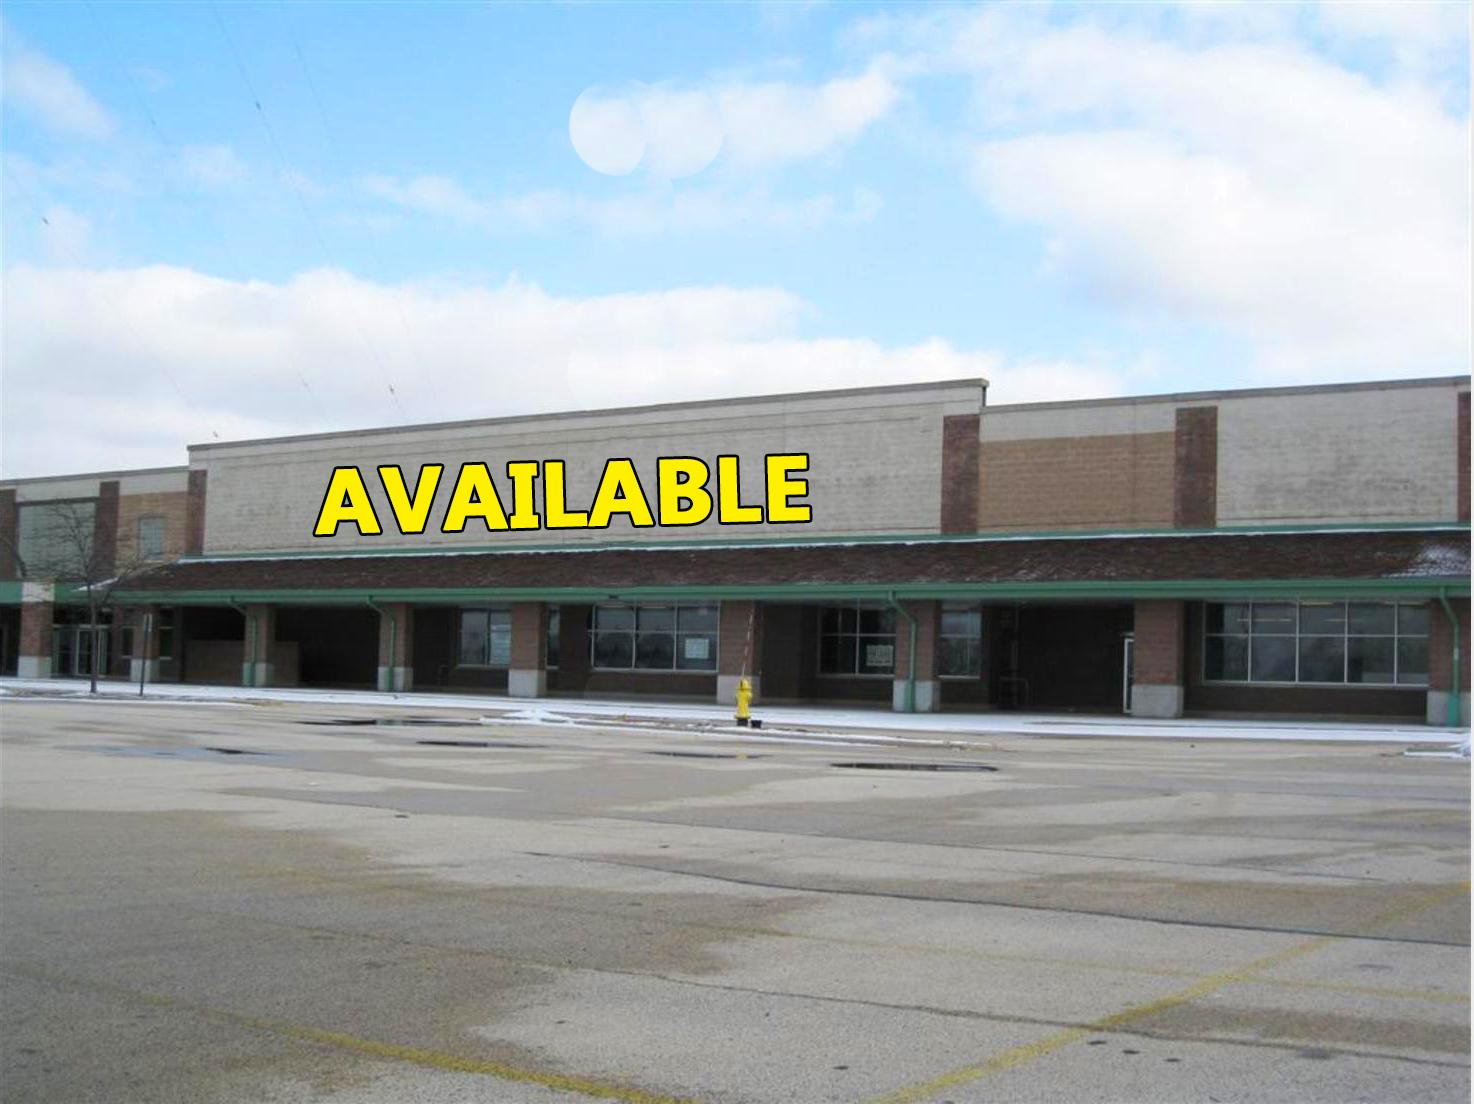 Home Depot Glendale Heights on tulsa depot, arcadia depot, san bernardino depot, huntsville depot, new haven depot, boise depot, detroit depot, santa fe depot, pensacola depot,